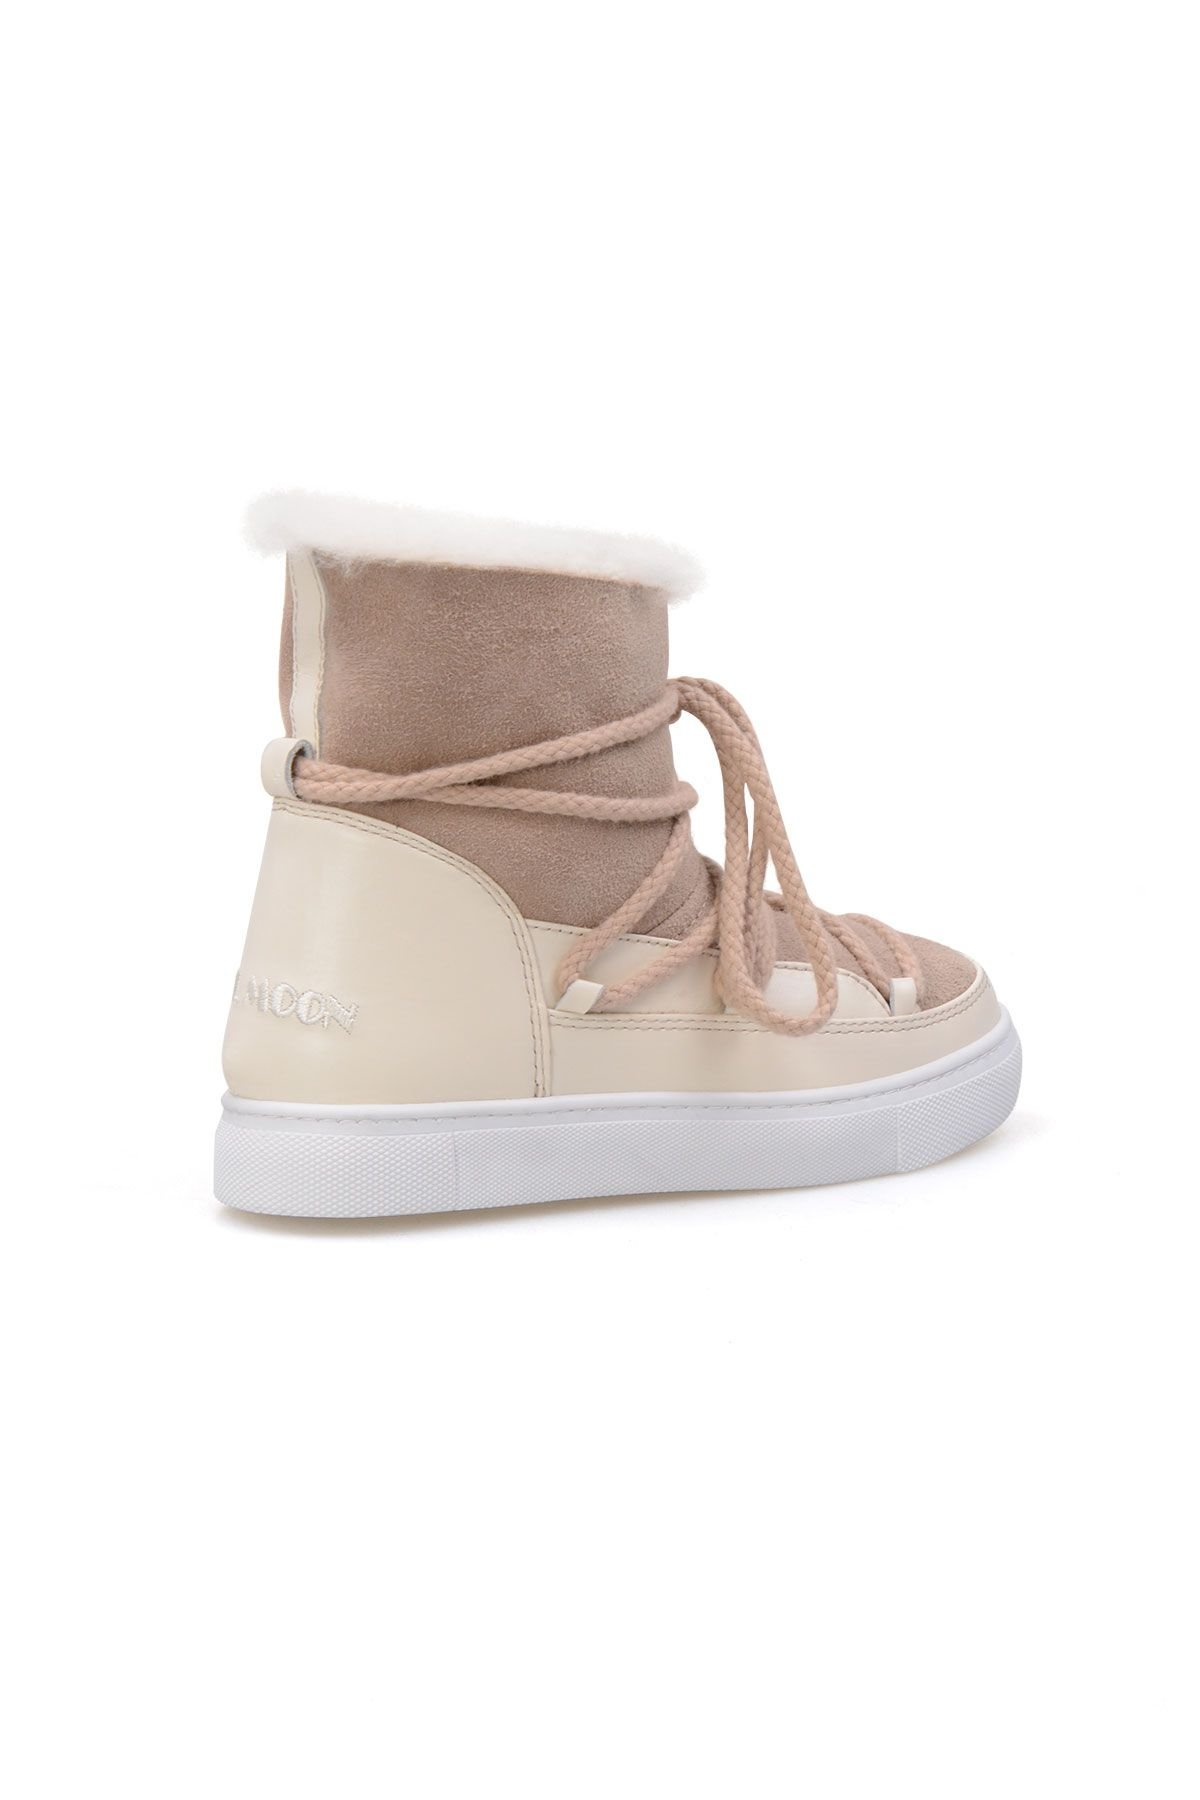 Cool Moon Hakiki İçi Kürk Bayan Sneaker 355050 Bej